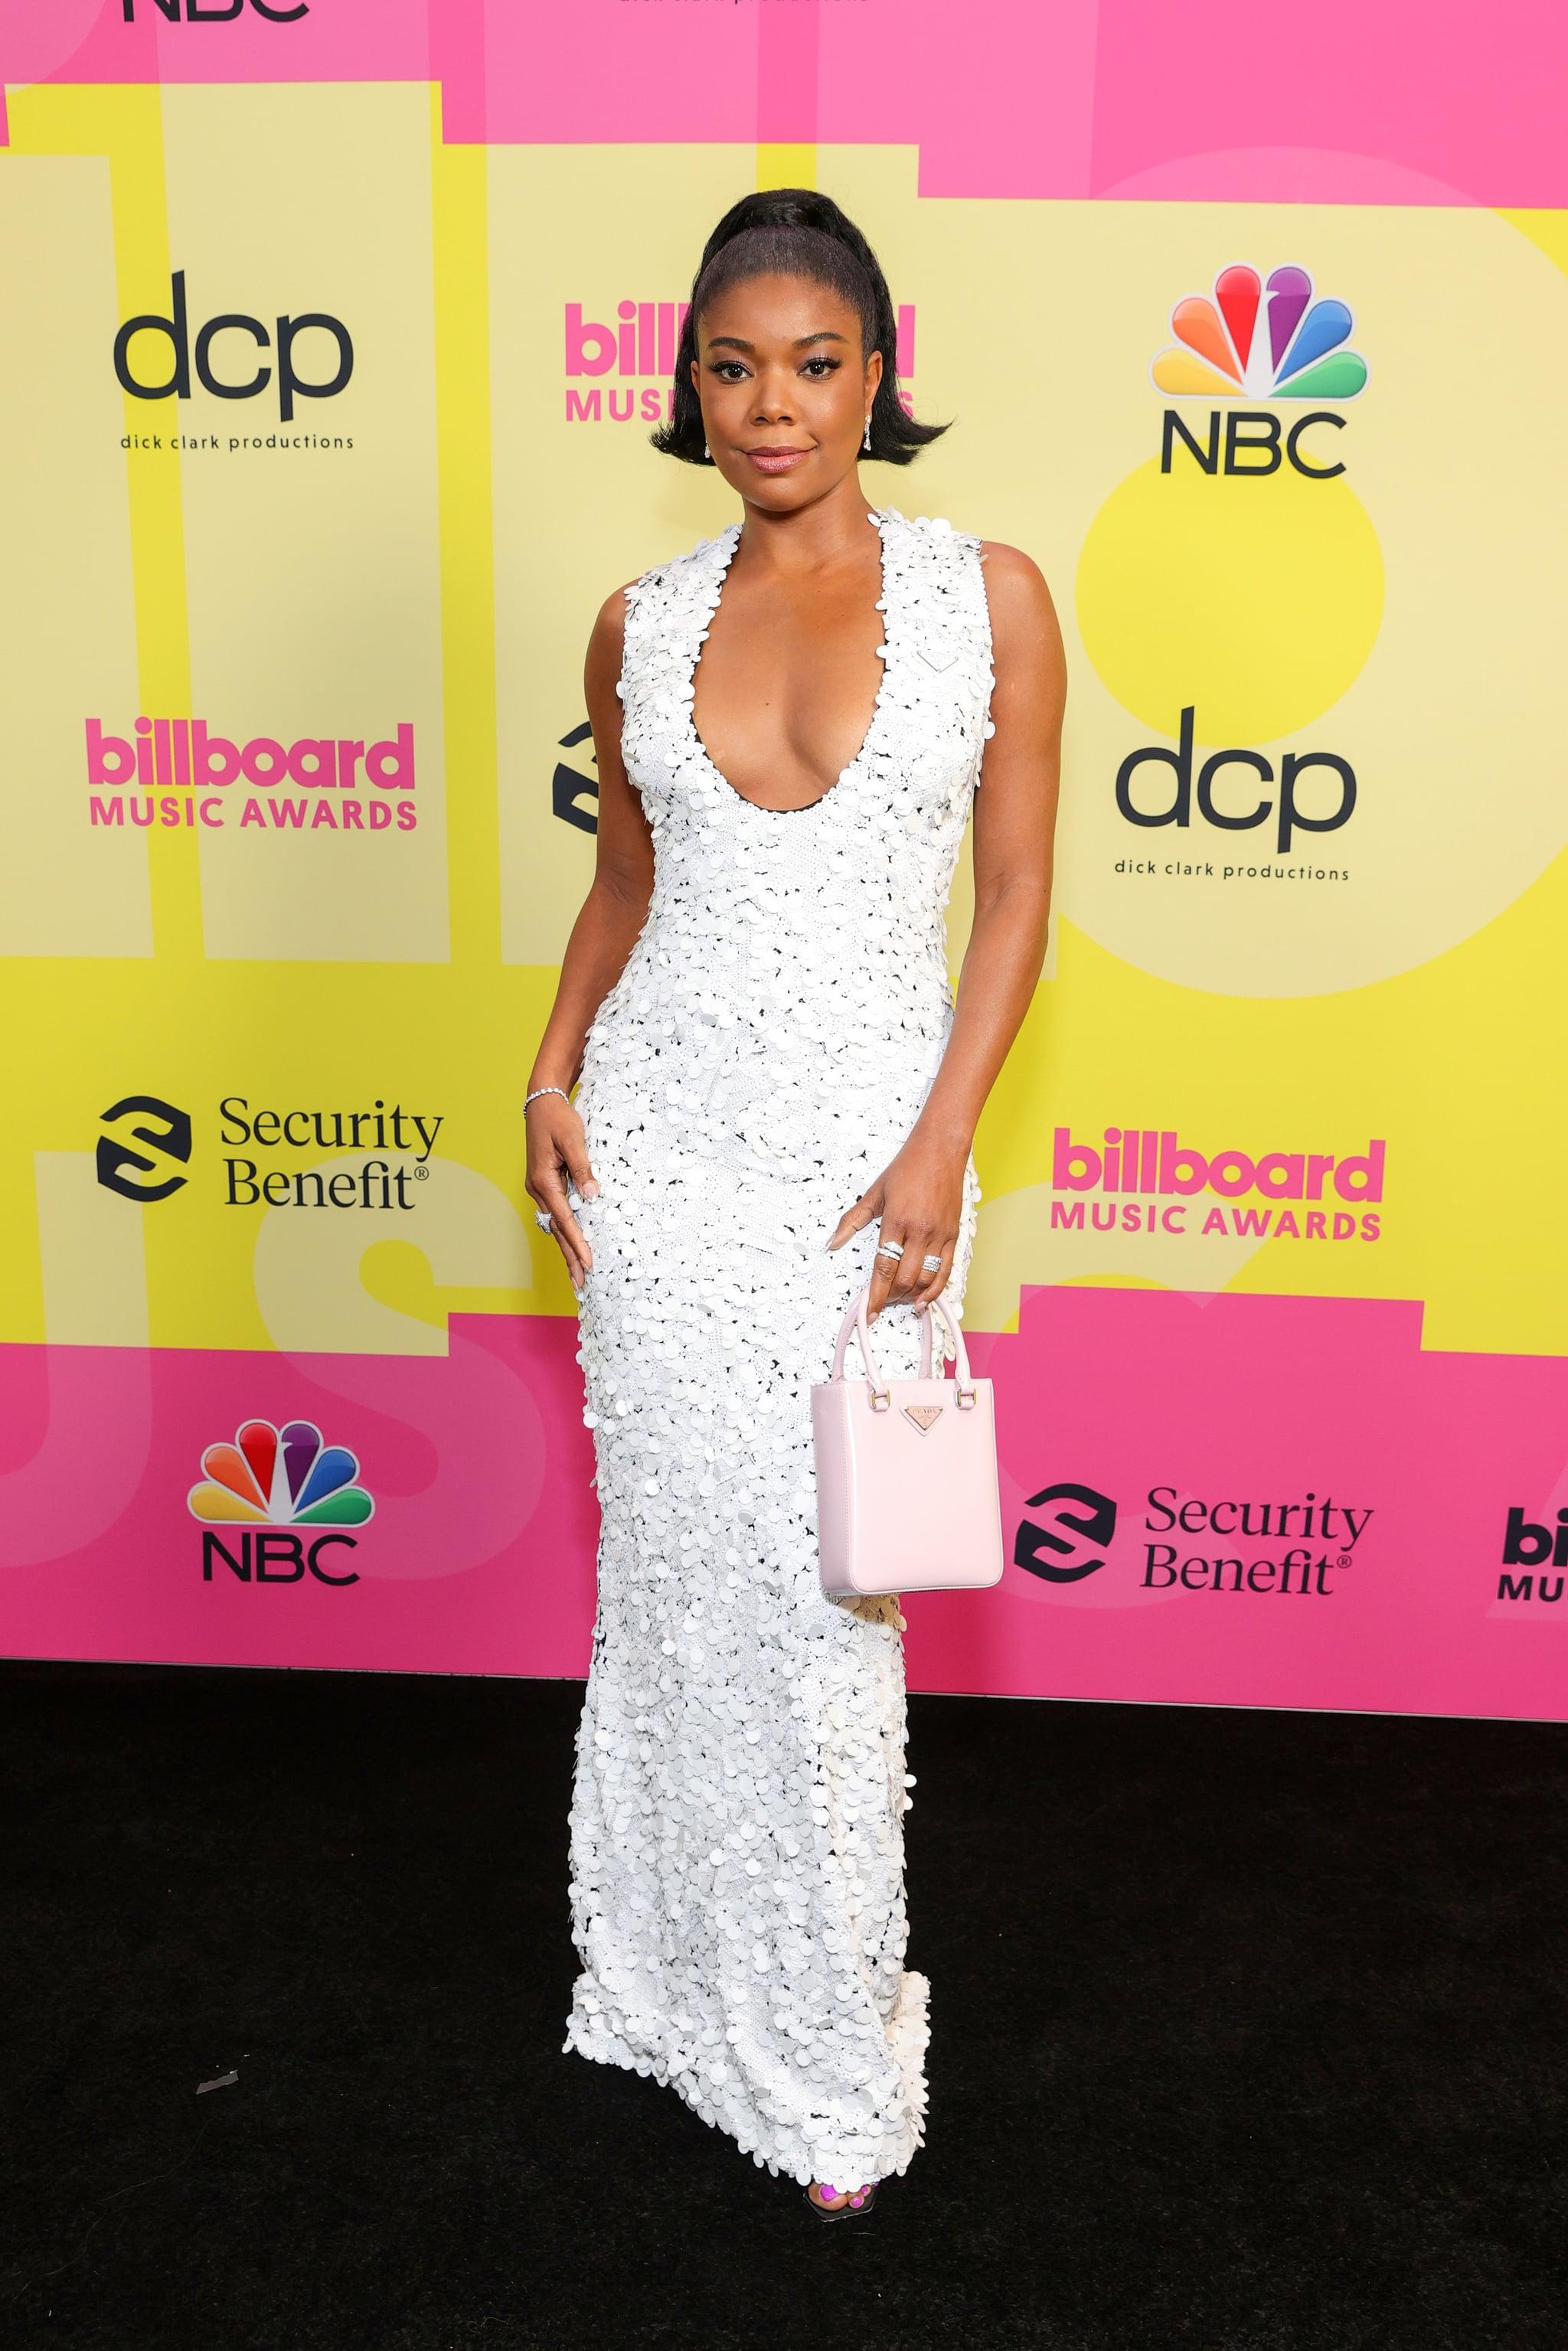 Gabrielle Union's White Prada Dress at 2021 Billboard Awards | POPSUGAR Fashion